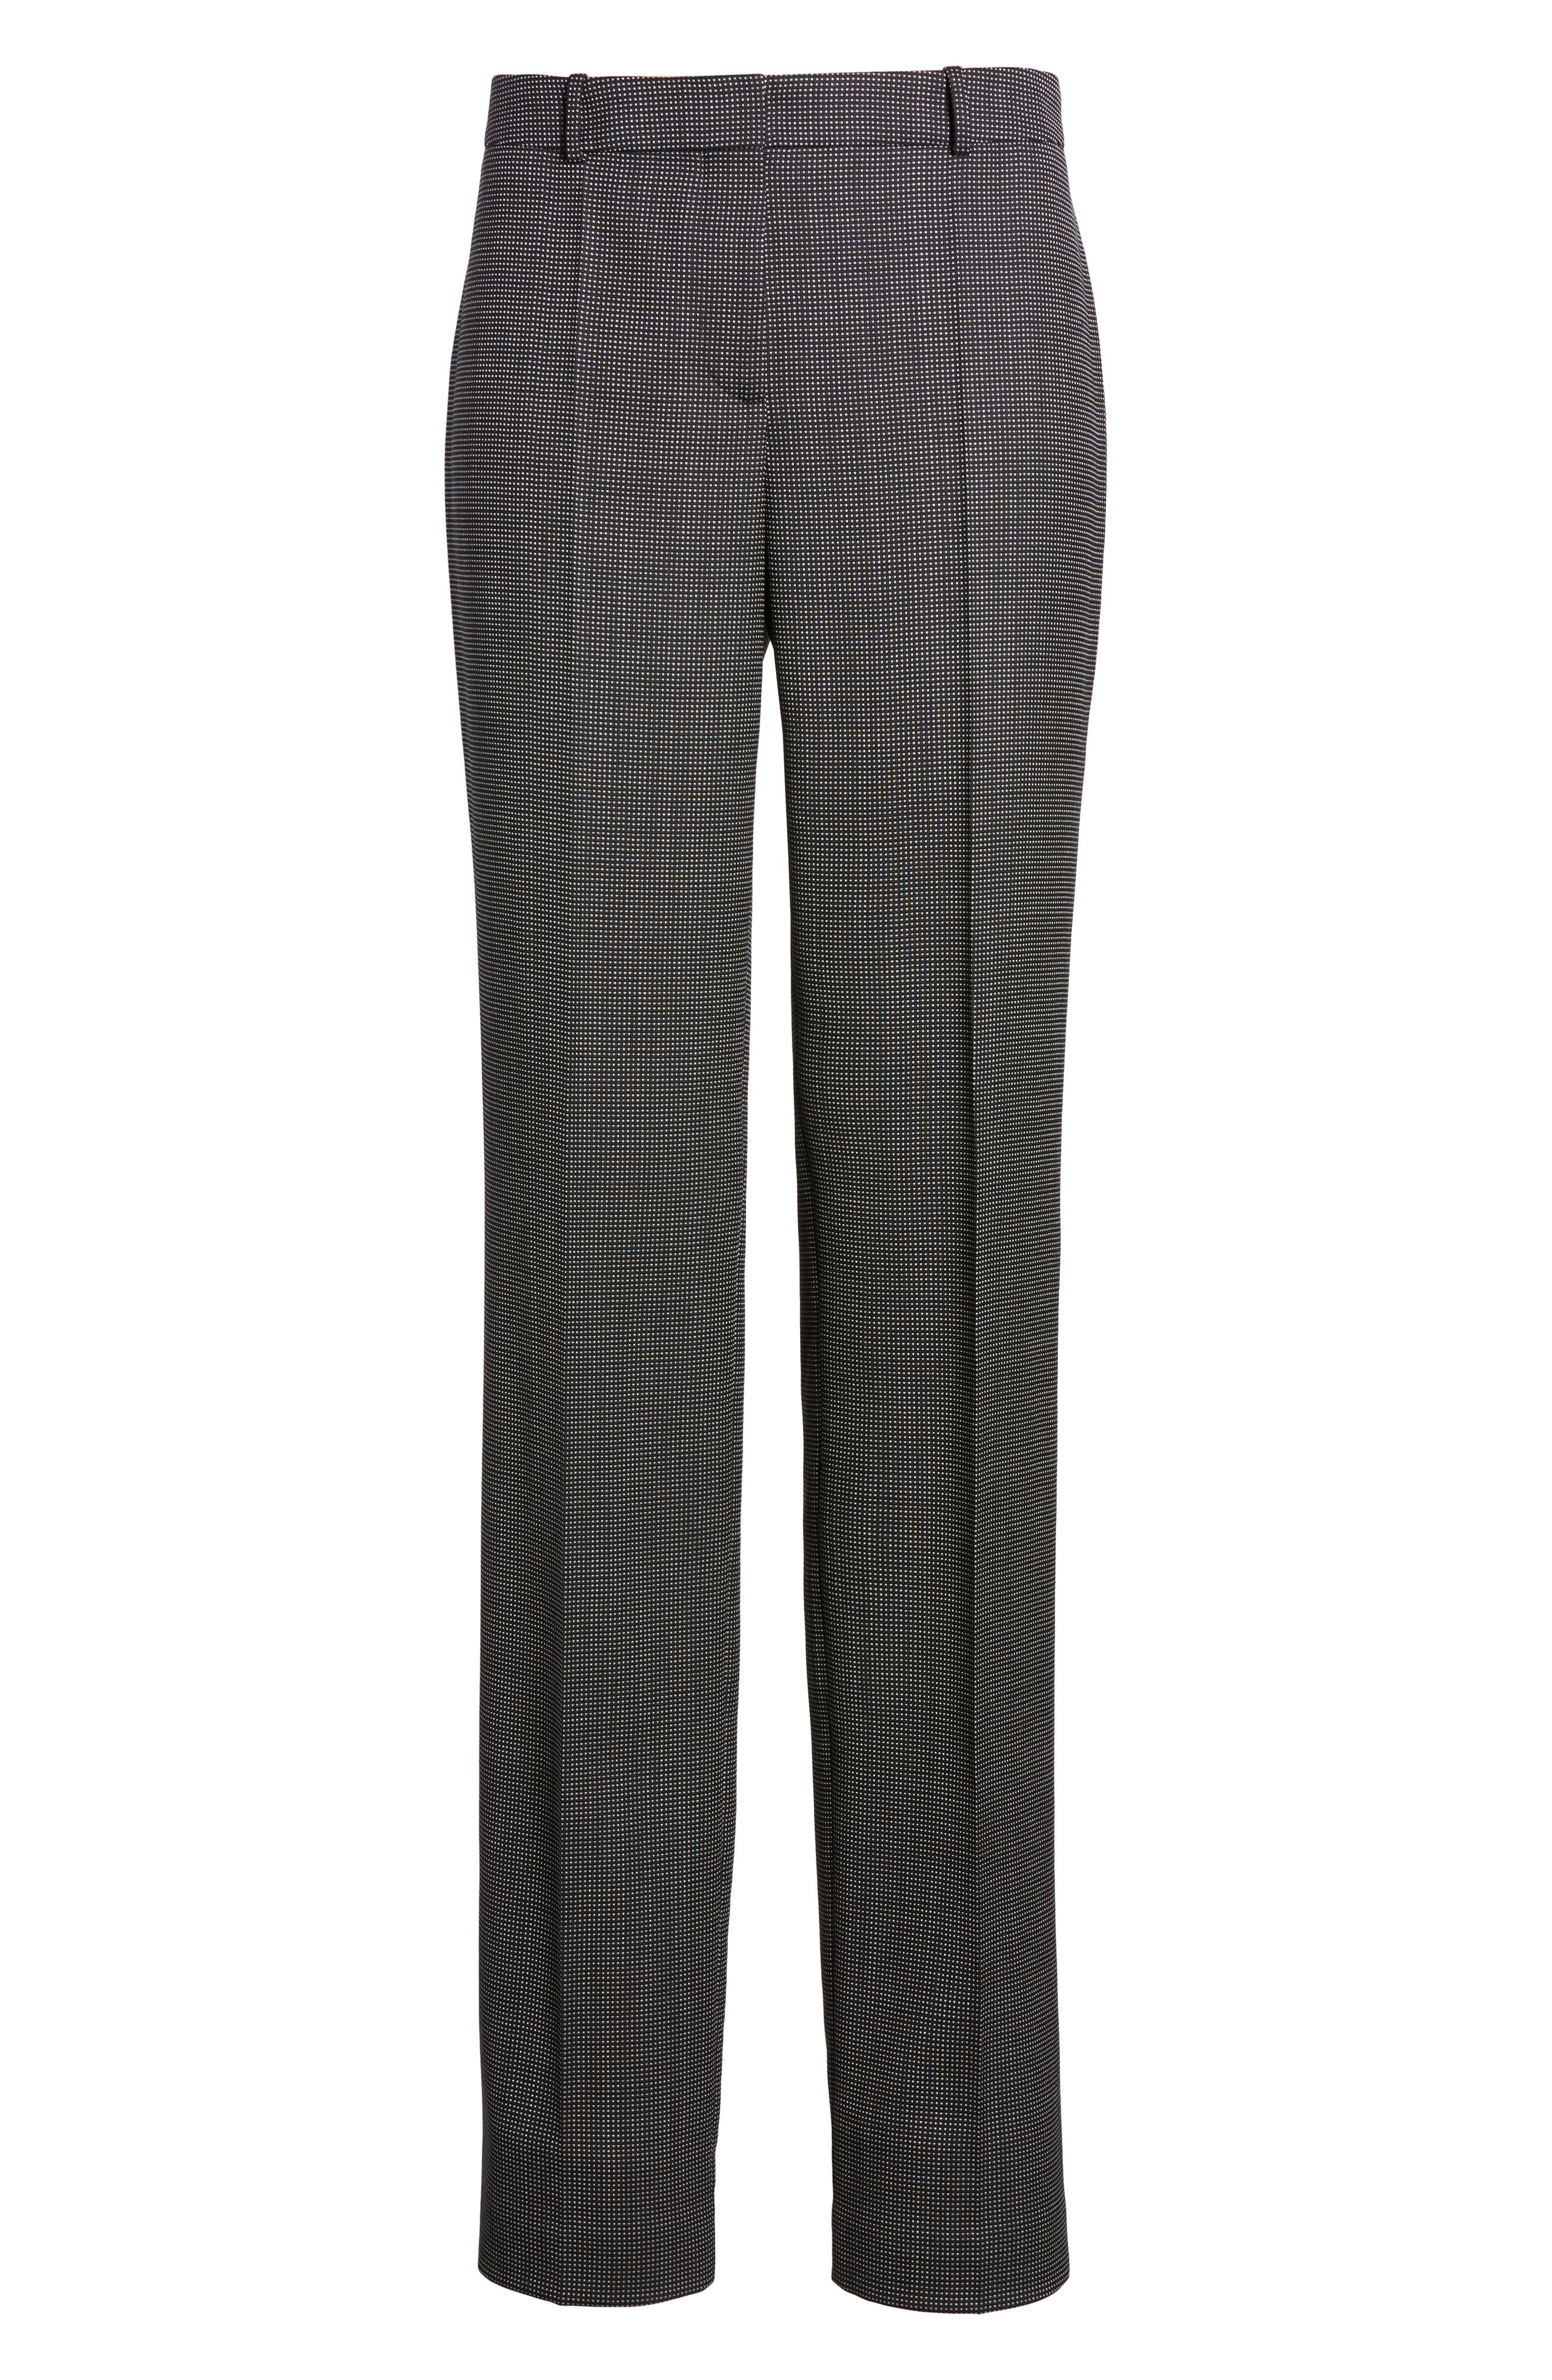 Tamea Straight Leg Stretch Wool Suit Pants,                             Alternate thumbnail 6, color,                             006